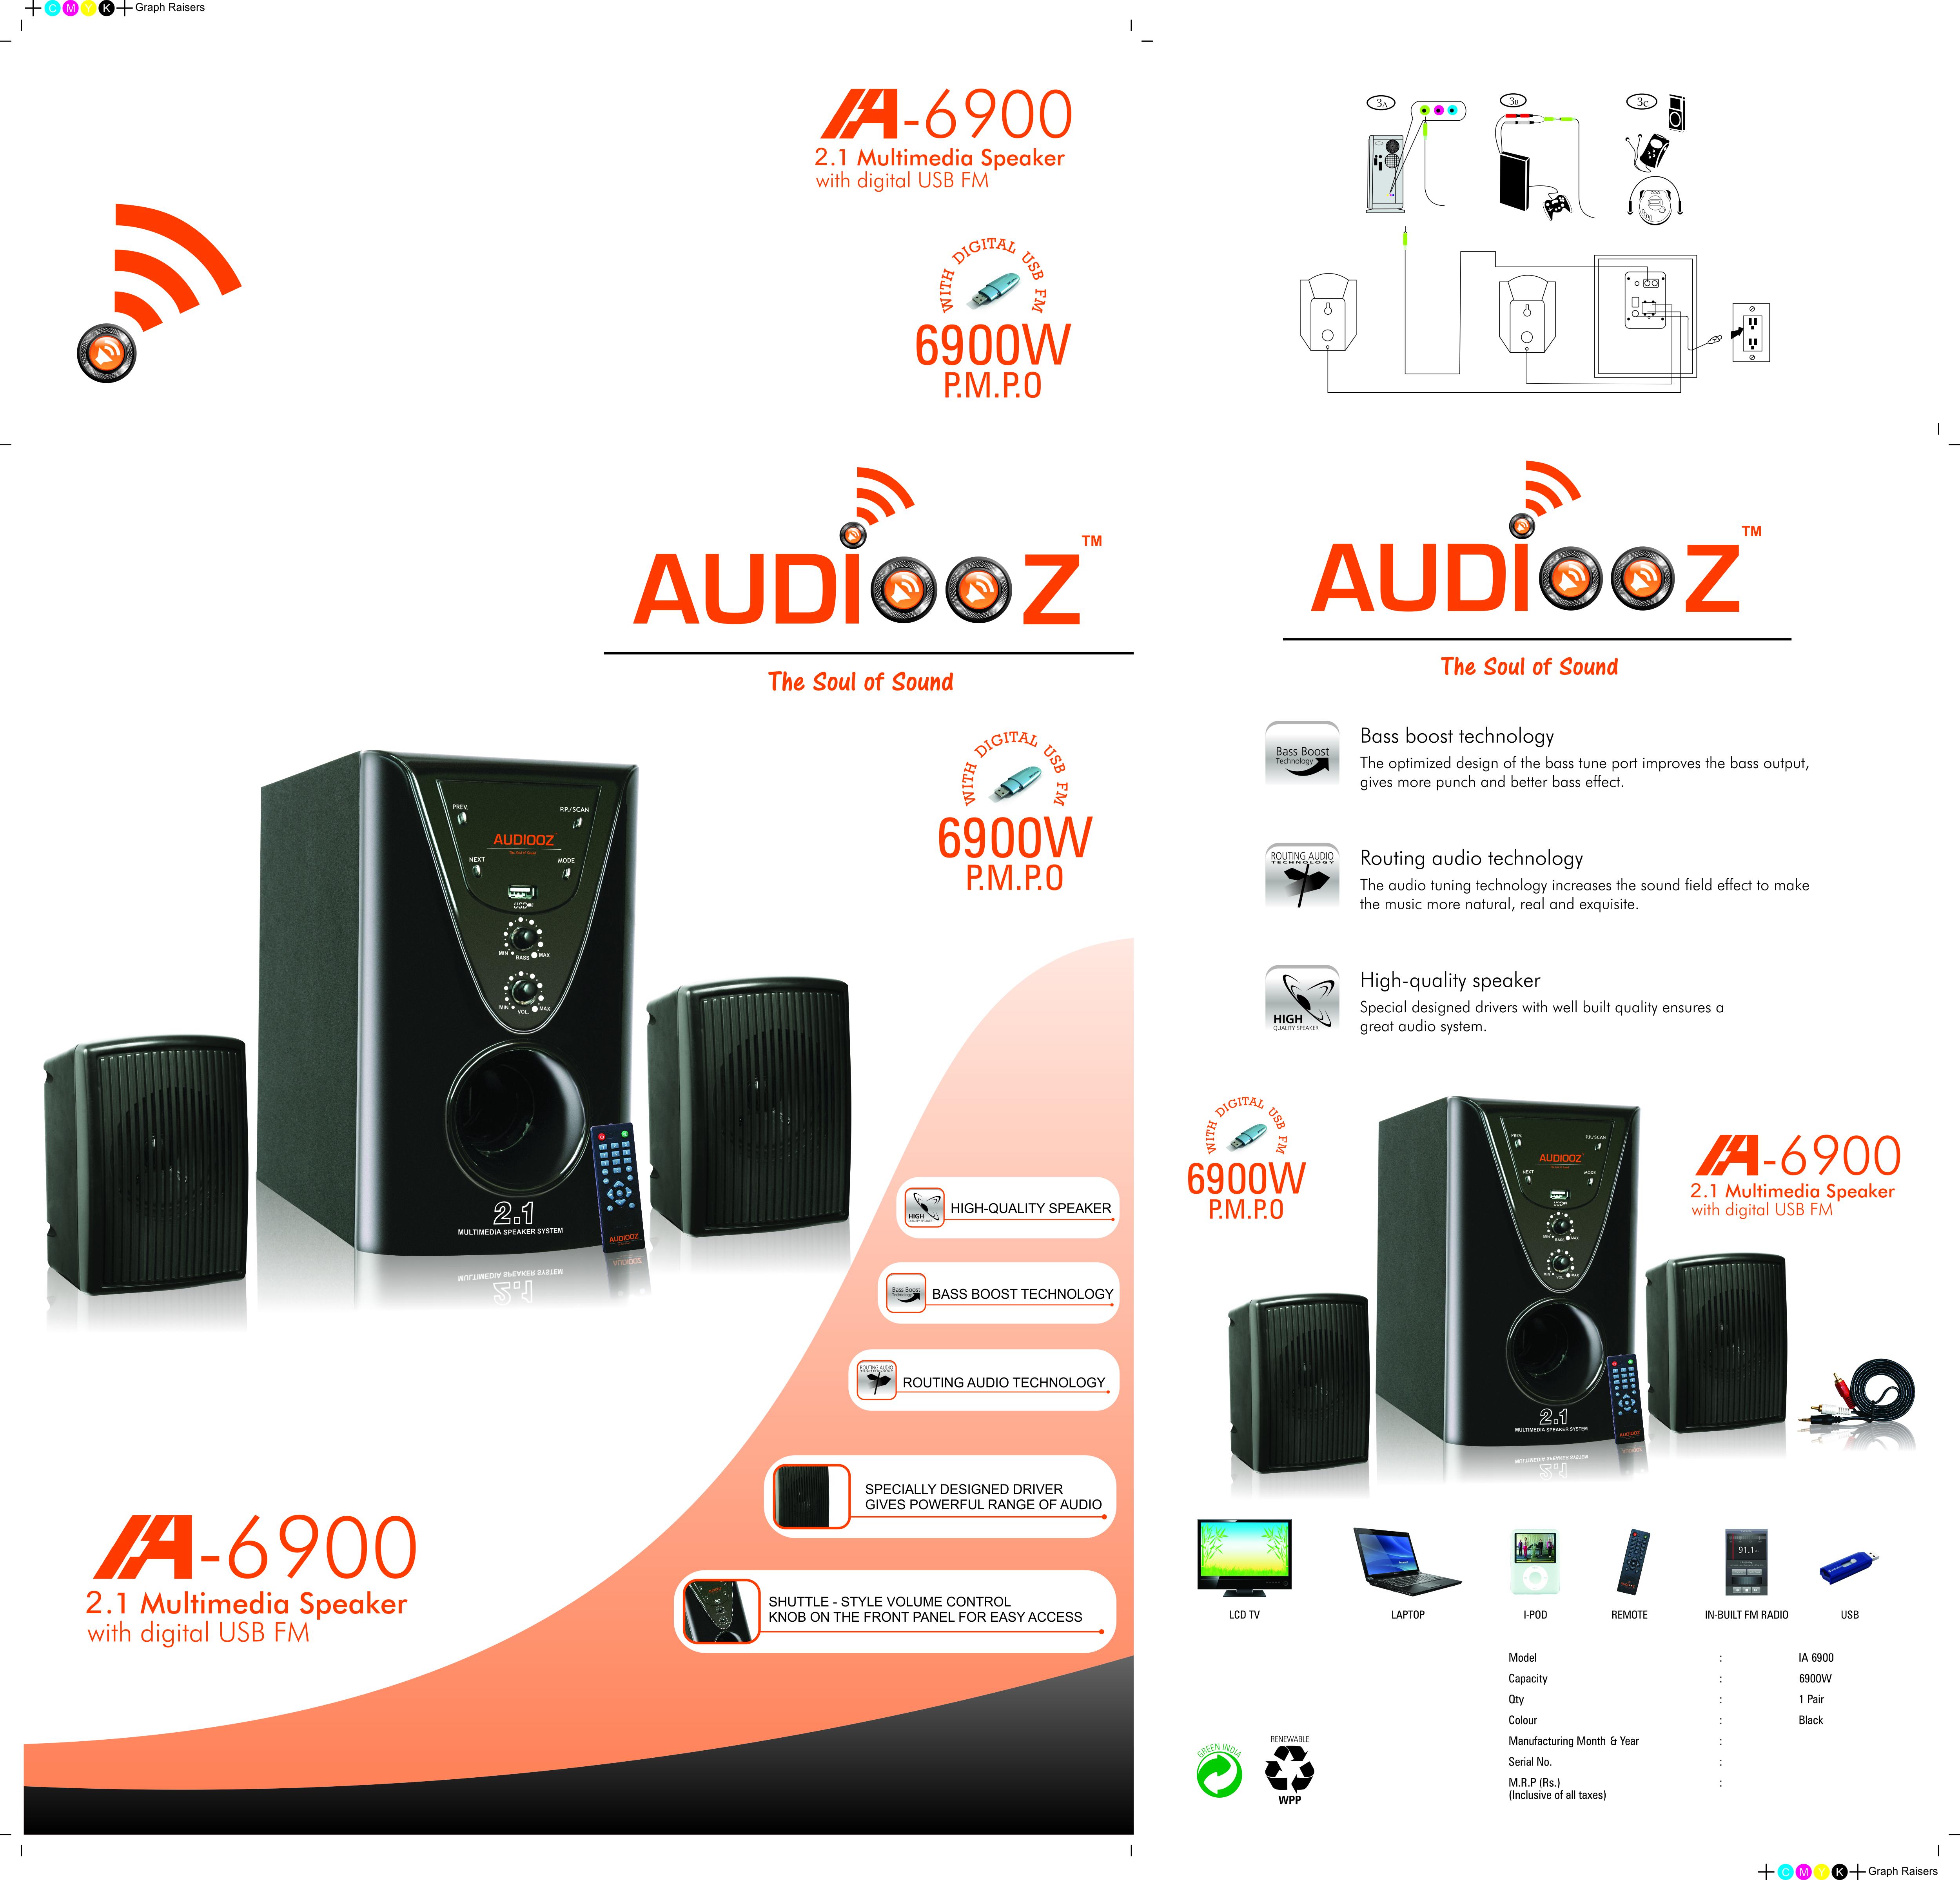 Audiooz Model - 6900